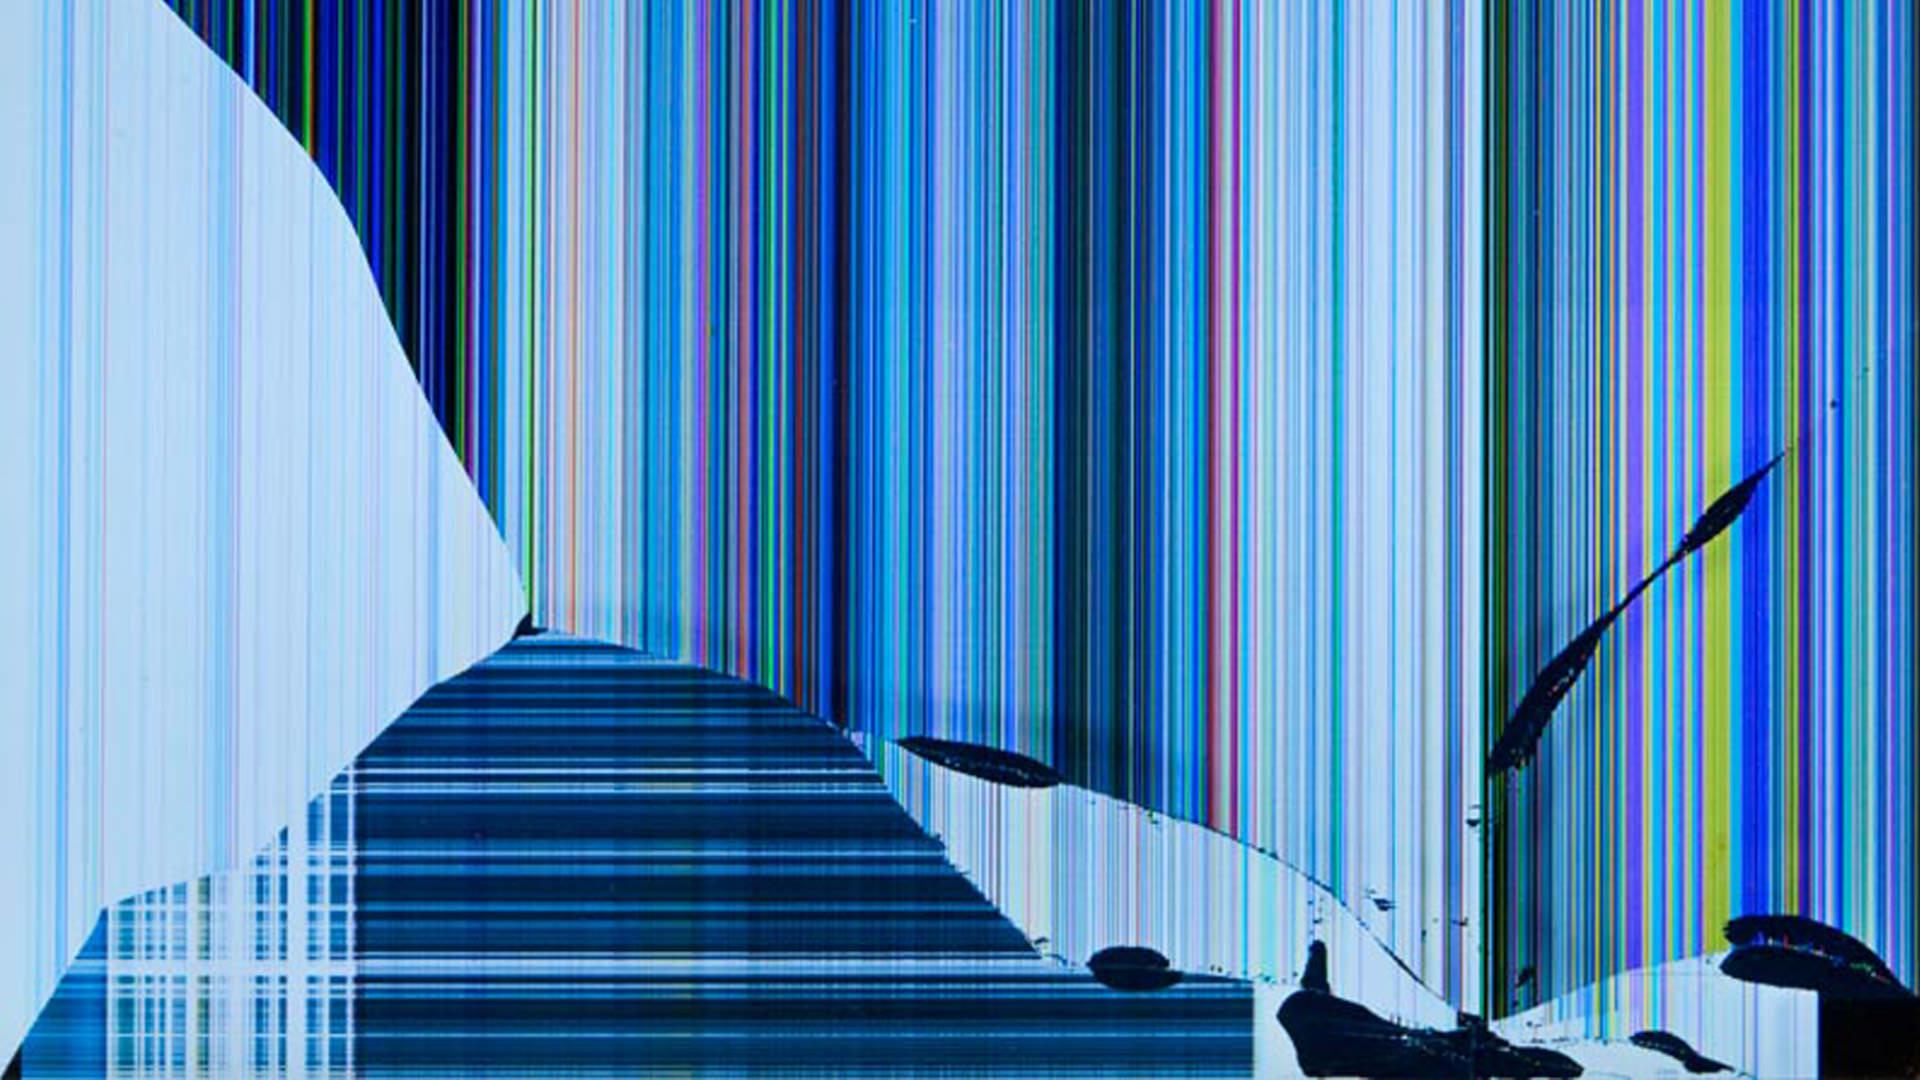 Smart Phone Wallpapers Girls Cracked Computer Screen Wallpaper 67 Pictures